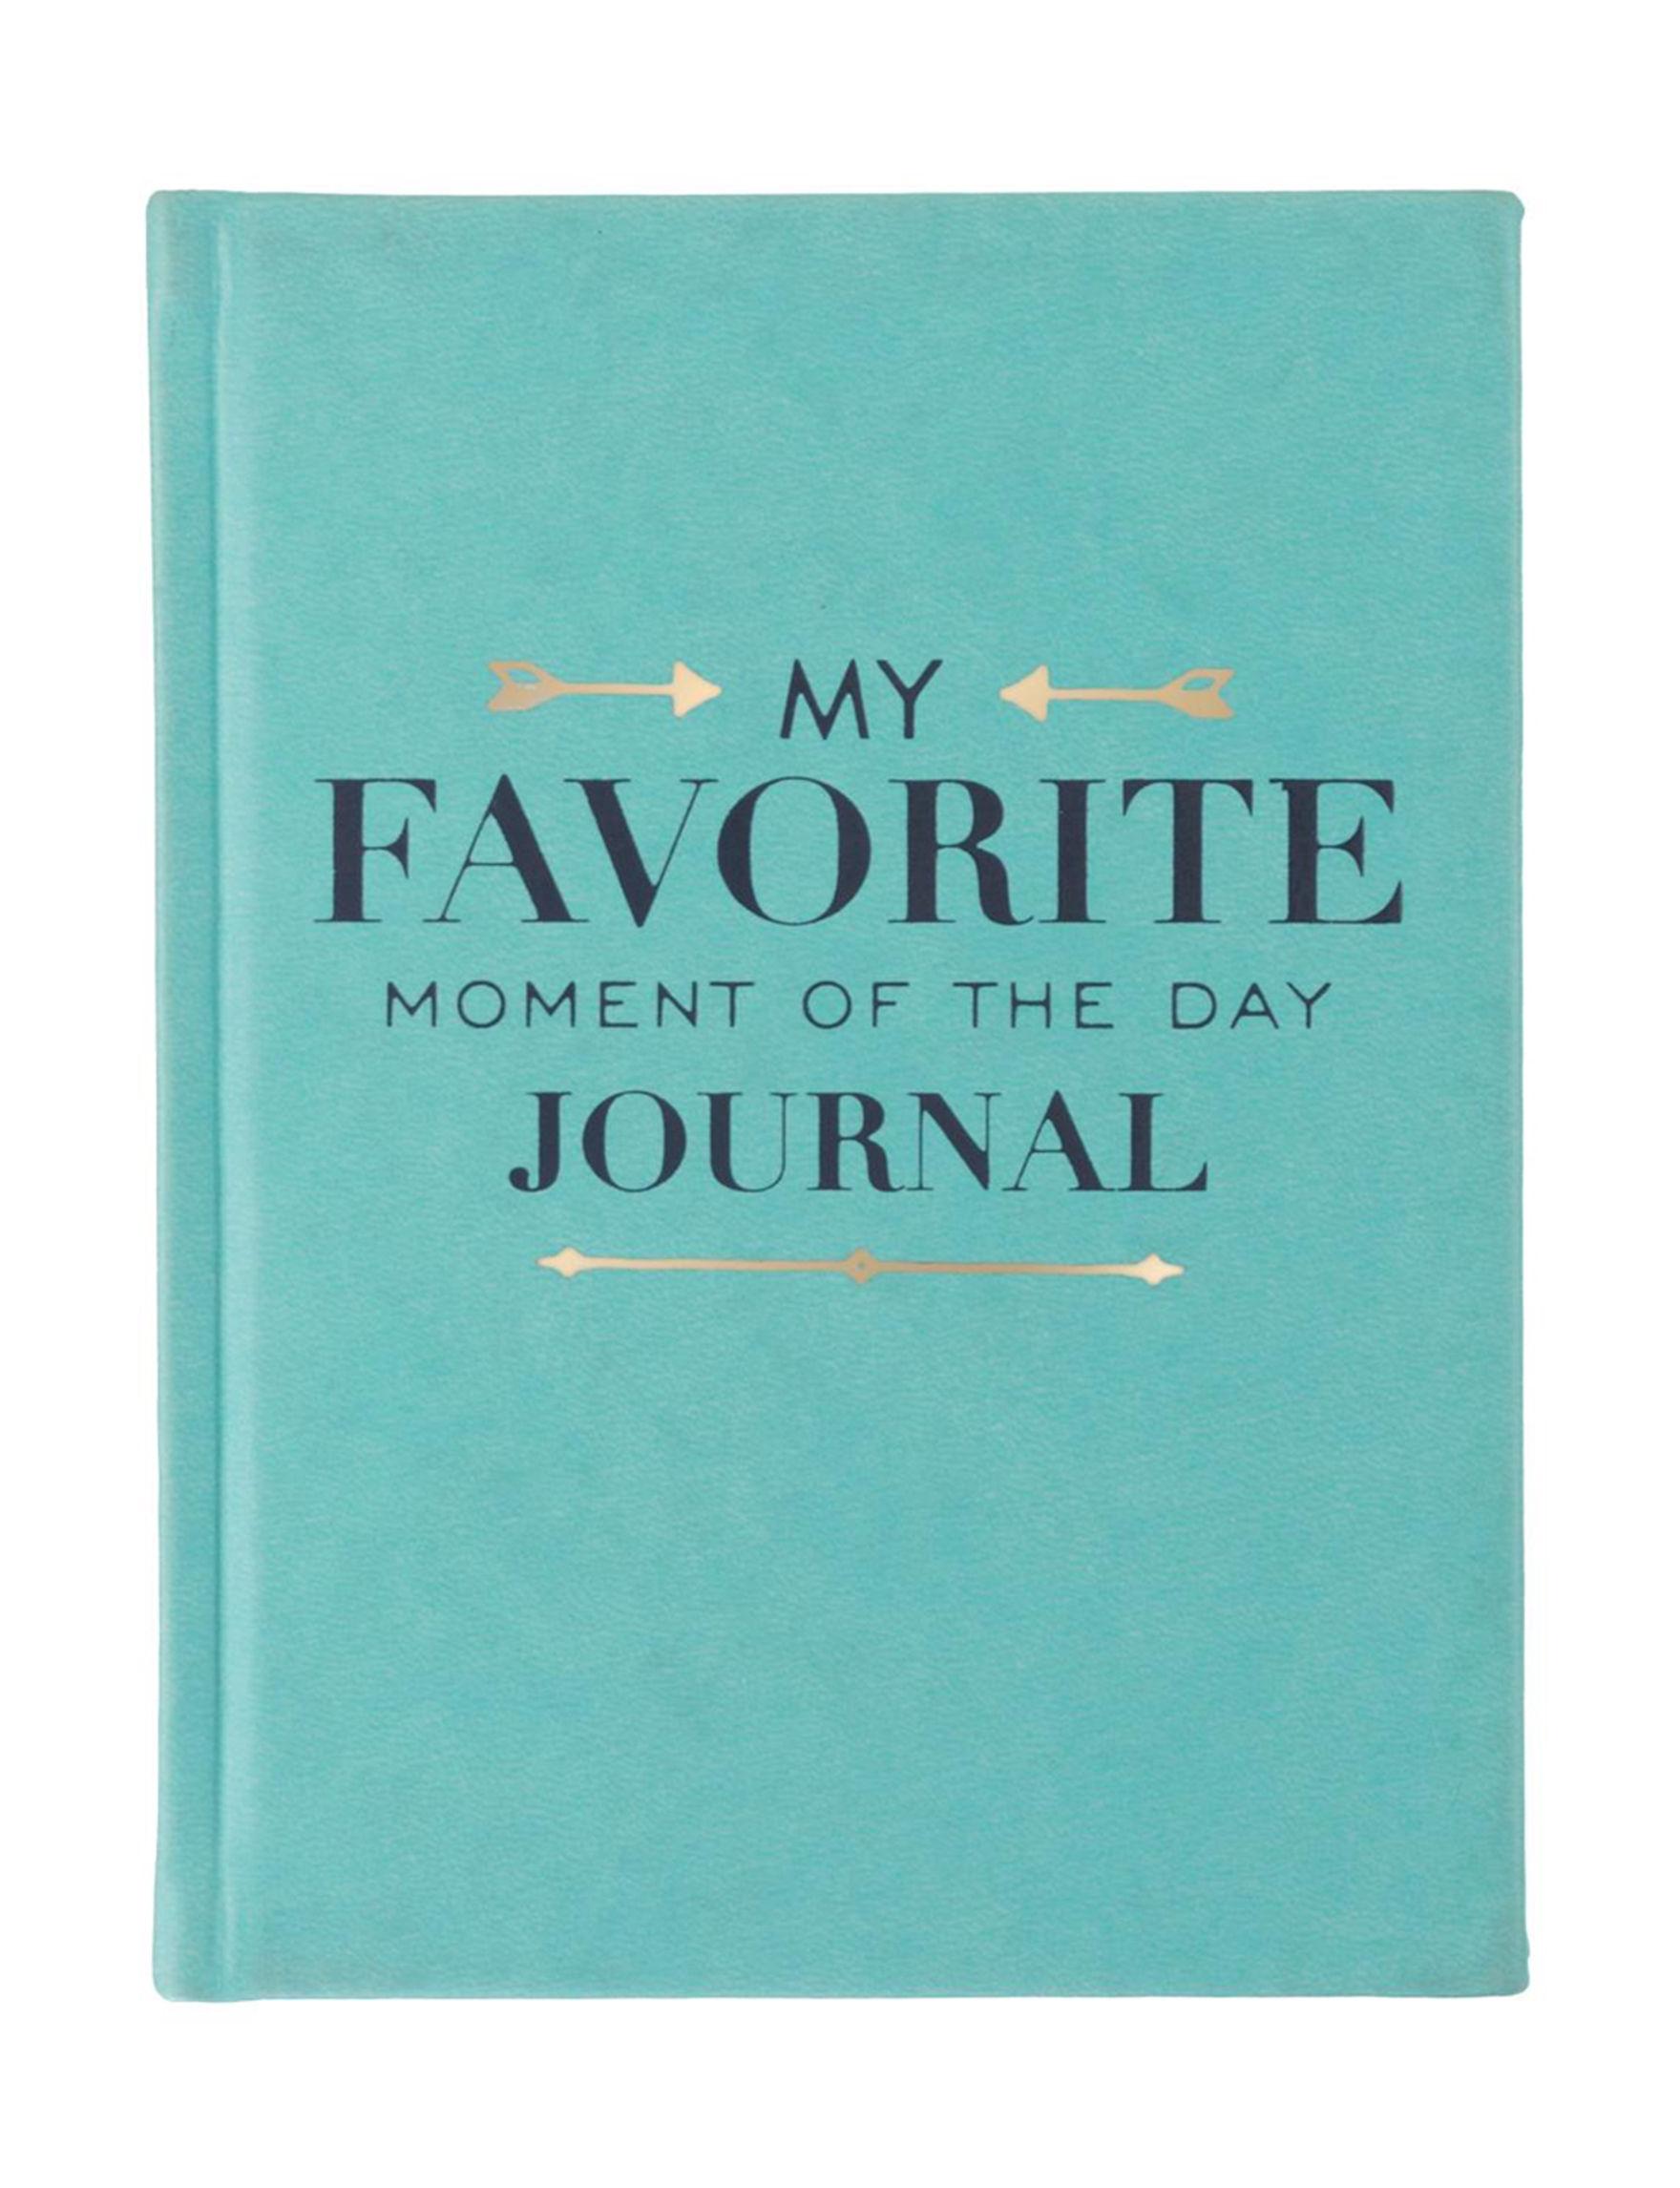 Eccolo Seafoam Journals & Notepads School & Office Supplies